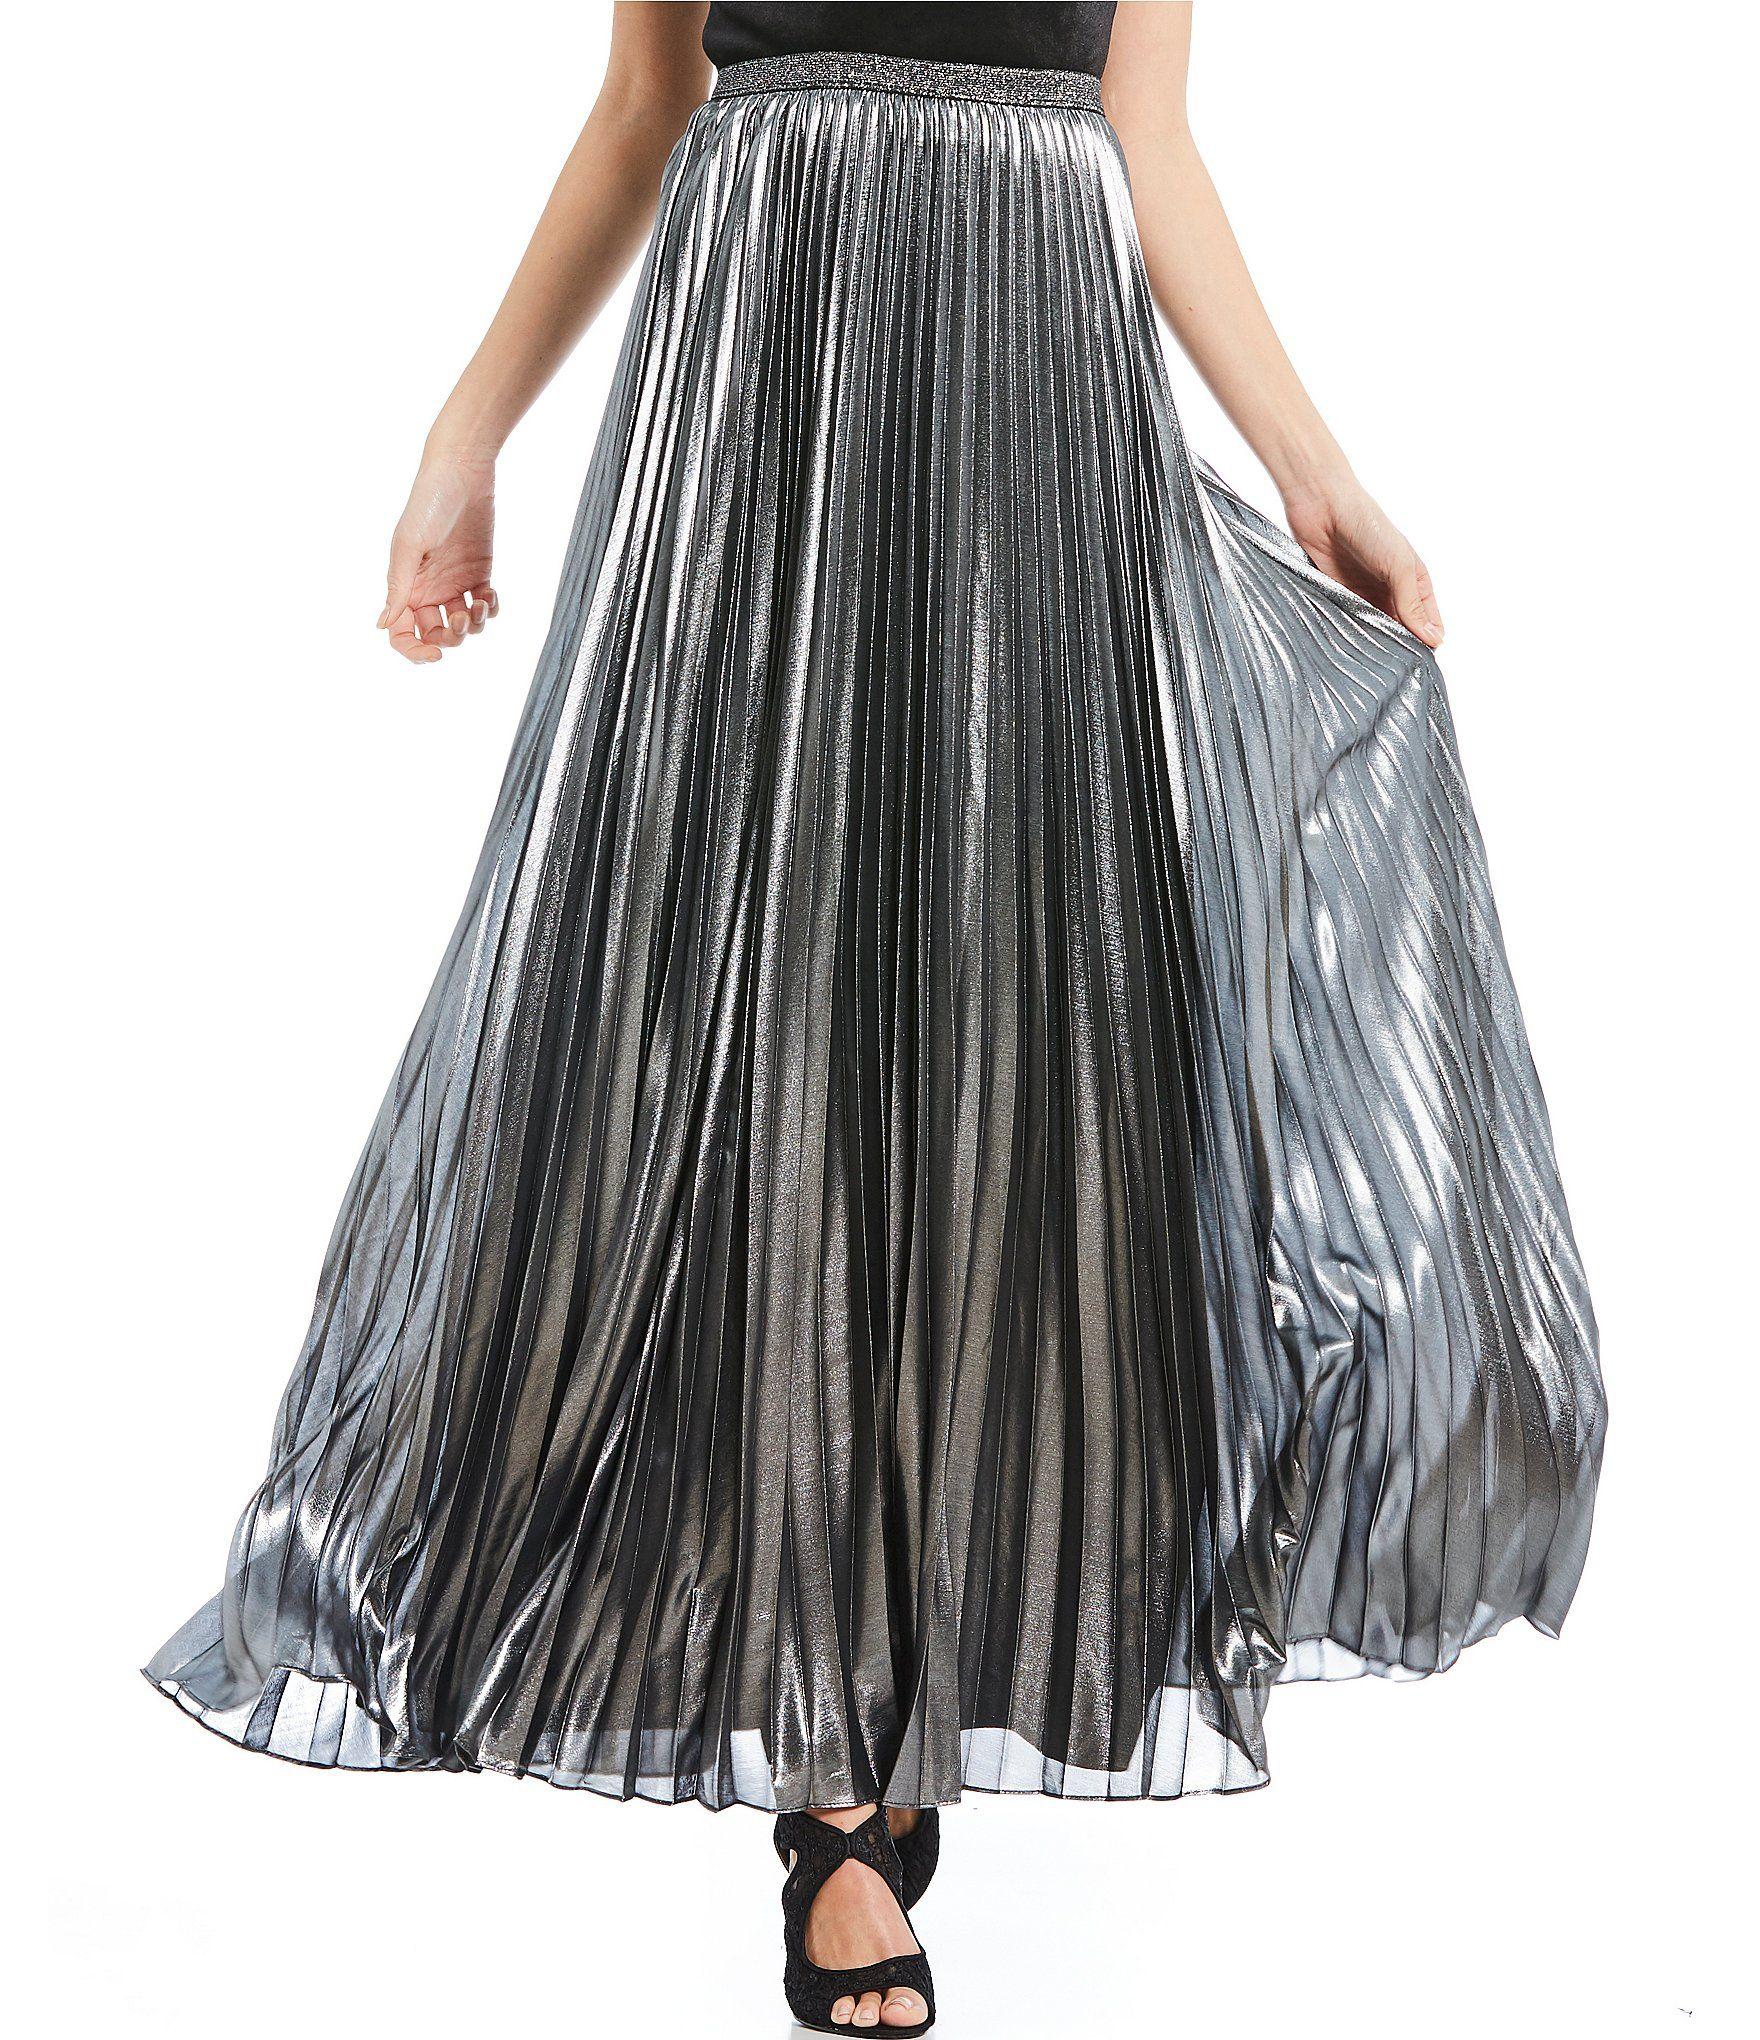 aaef1729986 Dillards Petite Maxi Skirts